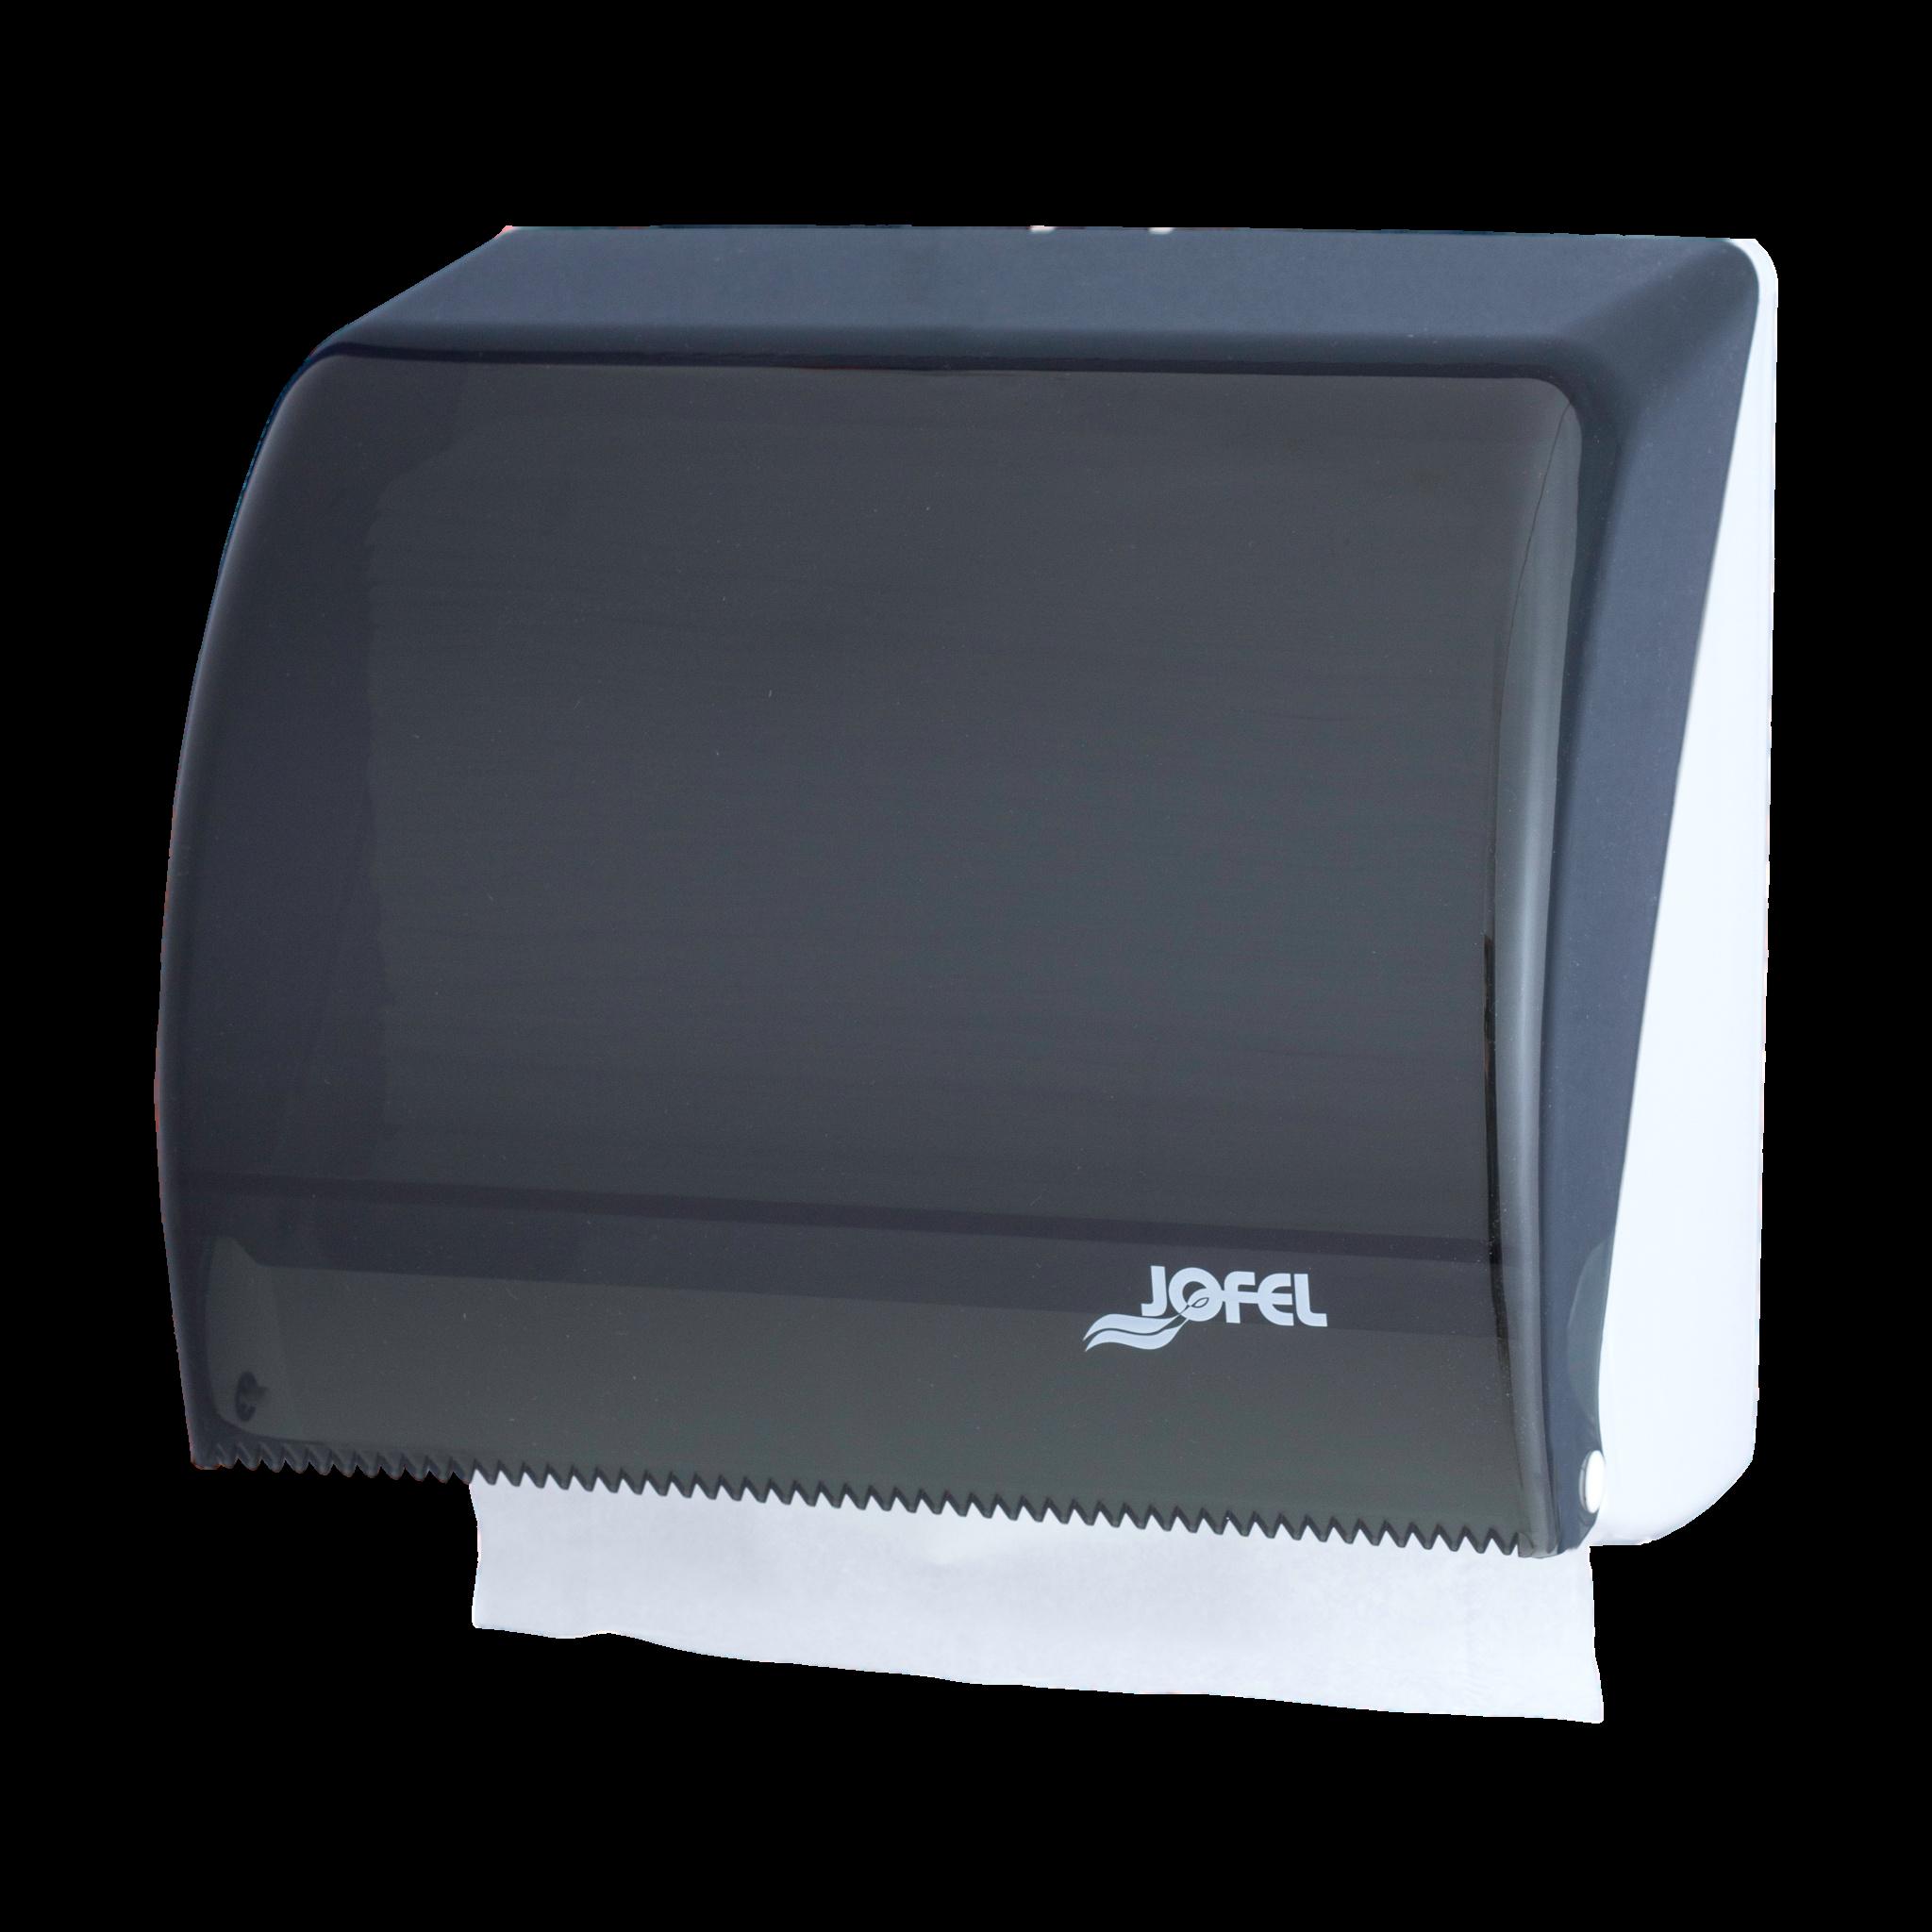 Jofel Azur Combi lehtkätepaberi või käterulli dosaator, Z, hall-läbipaistev, 25x26x18 cm